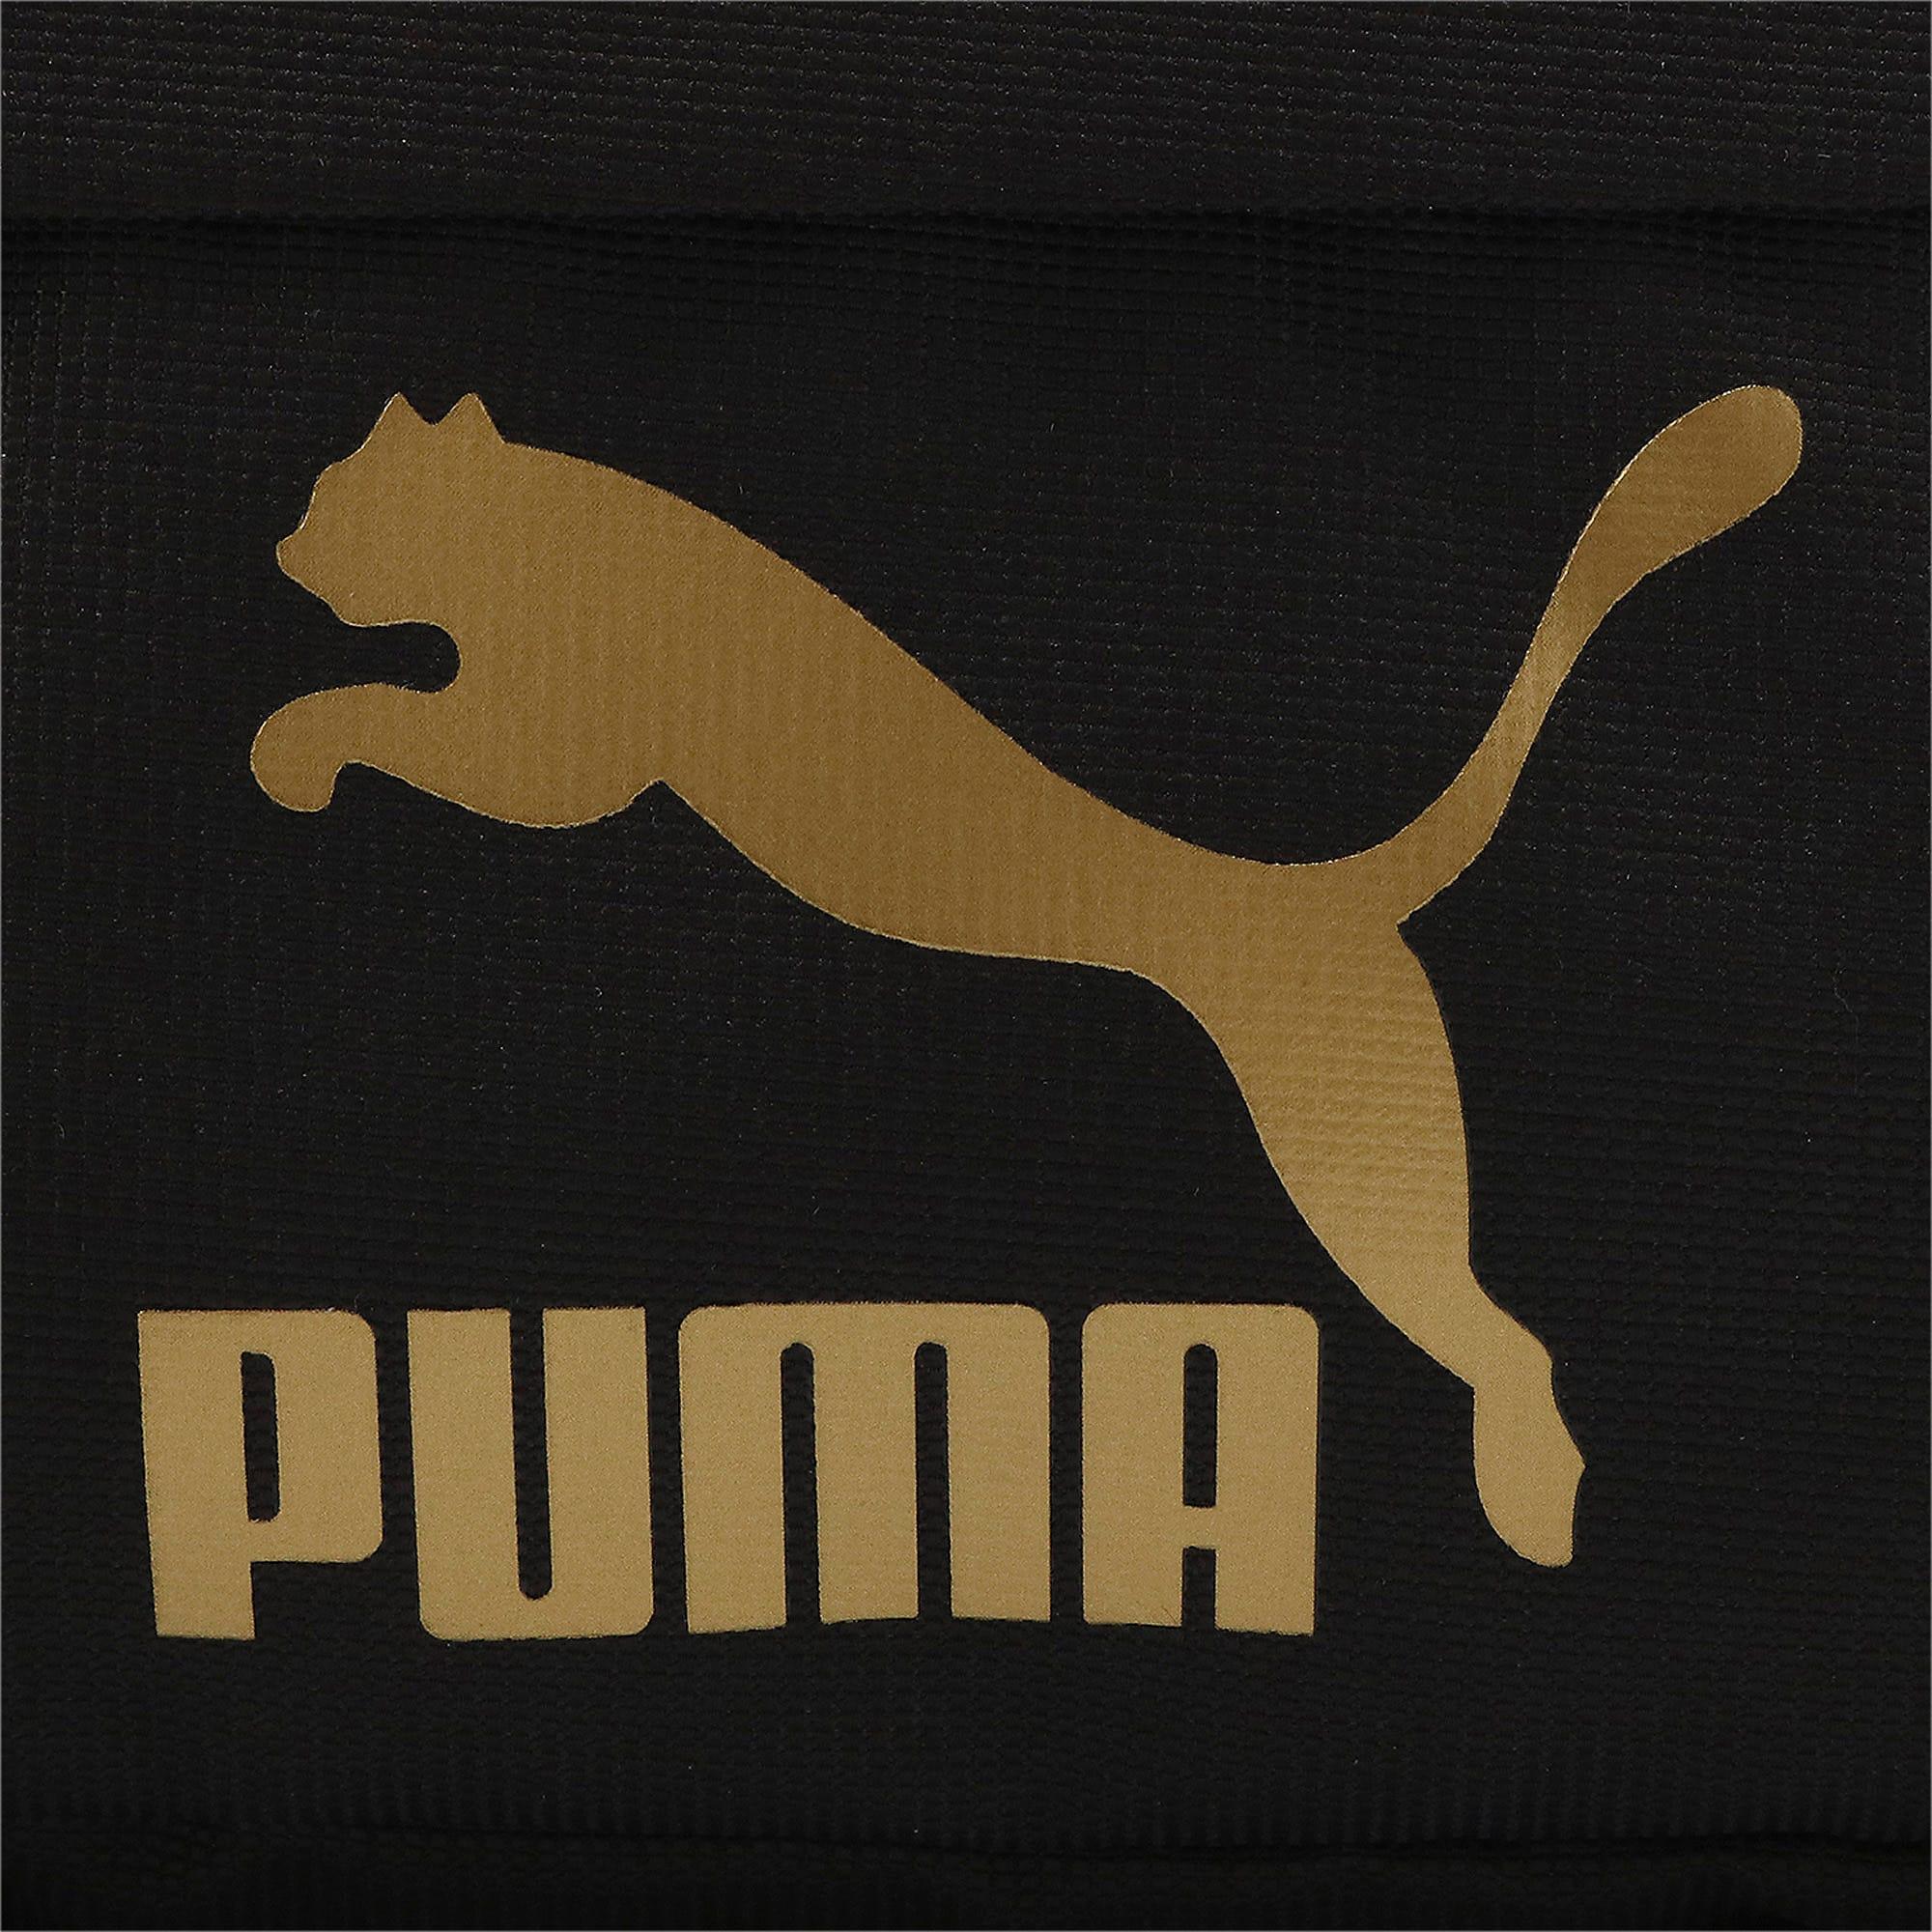 Thumbnail 5 of オリジナルス バム バッグ (3L), Puma Black, medium-JPN